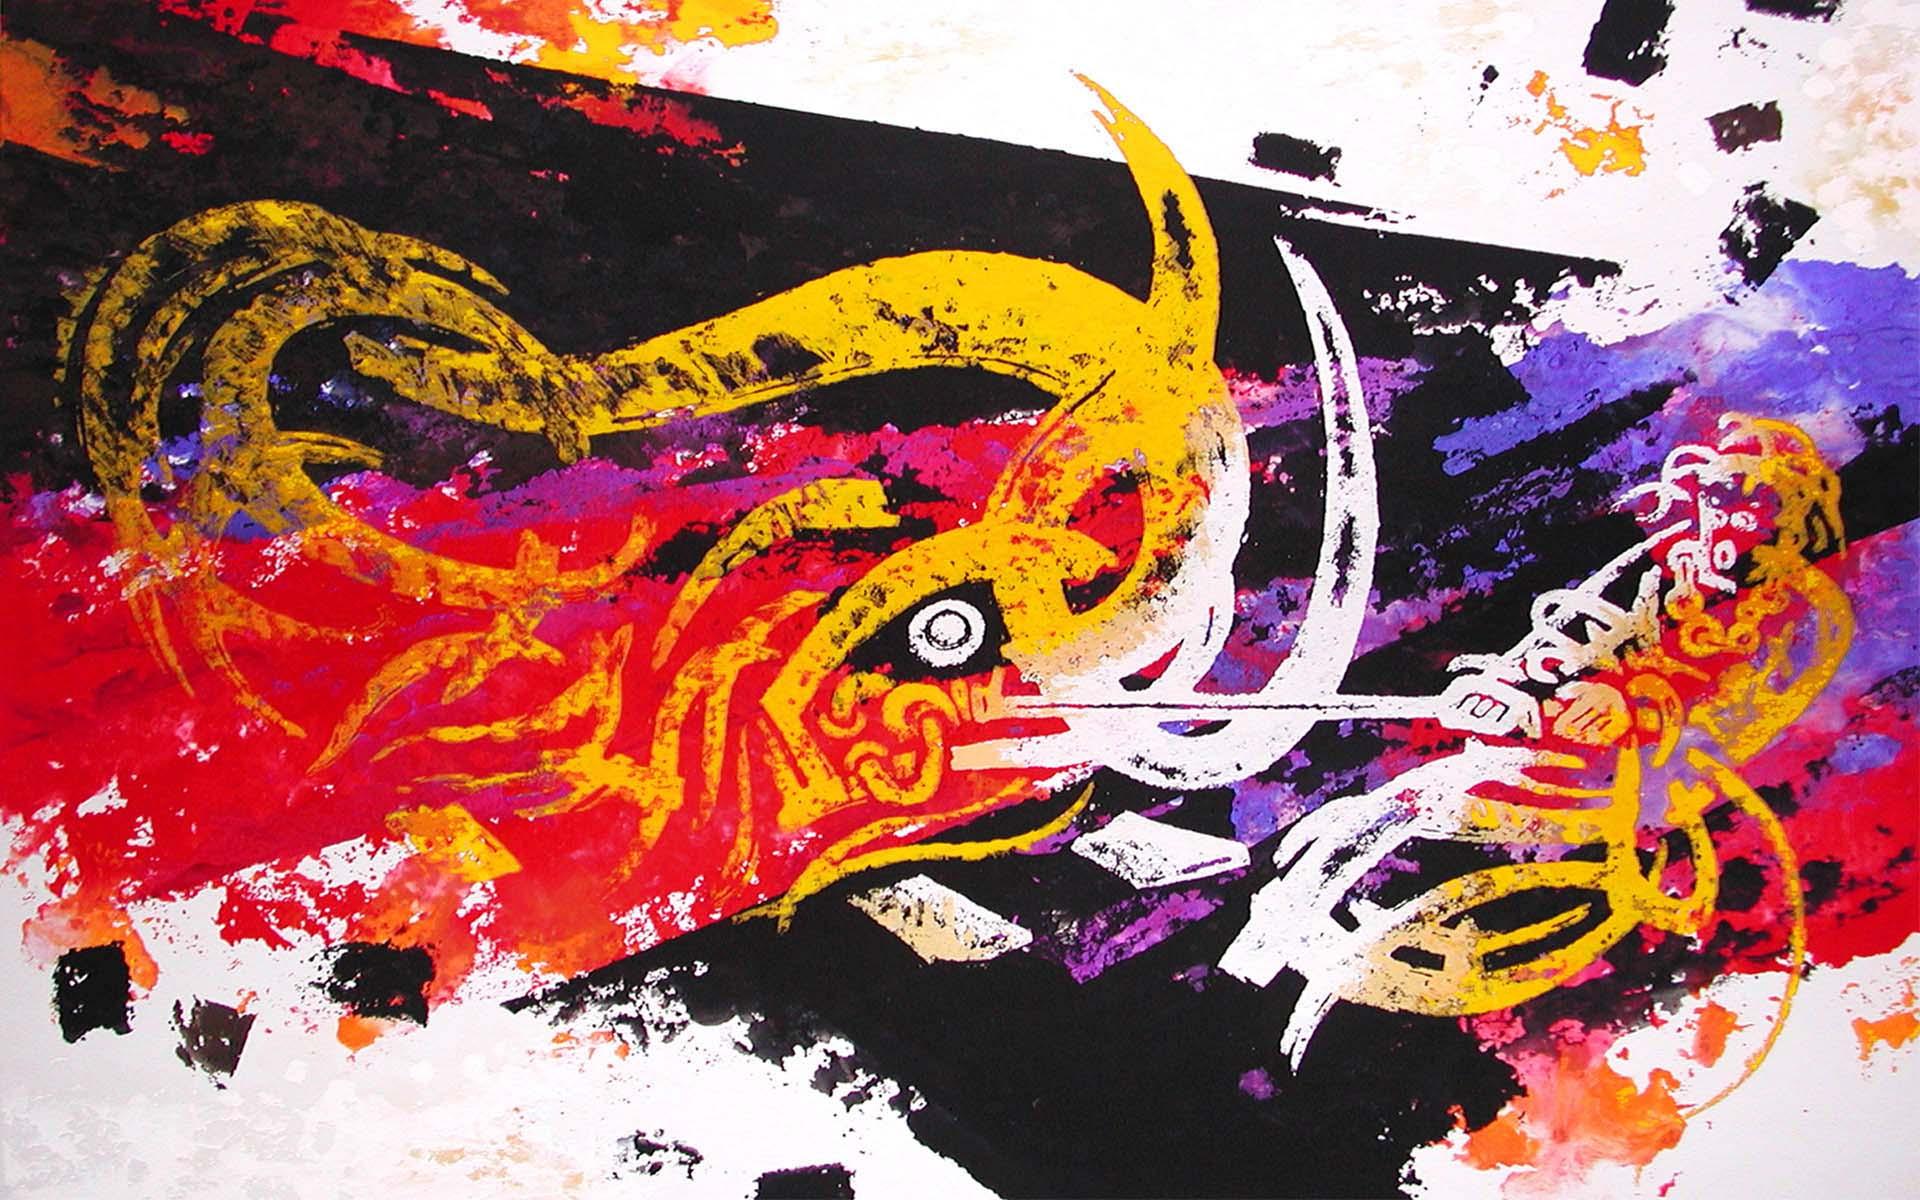 tibetan art 14 hd tibetan art 11 hd 1920 x 1200 tibetan art 8 hd 1920 1920x1200